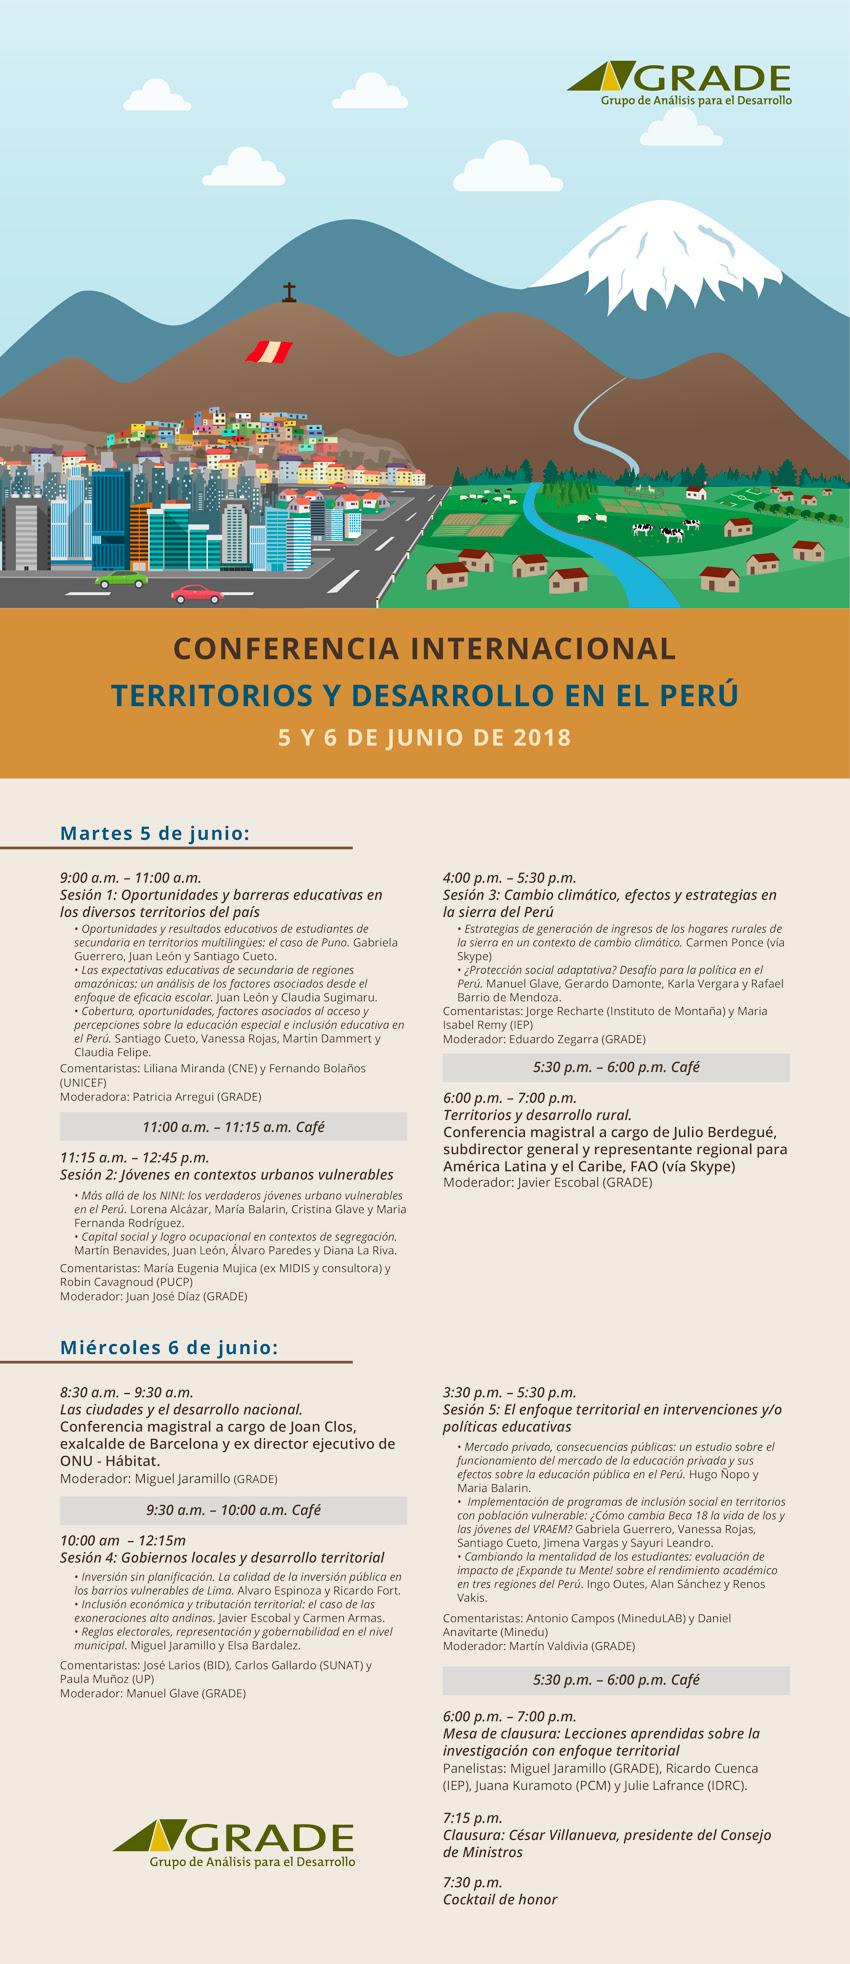 http://www.grade.org.pe/GRADEcoms/territorios/TerritoriosDesarrollo_arteprograma01.jpg